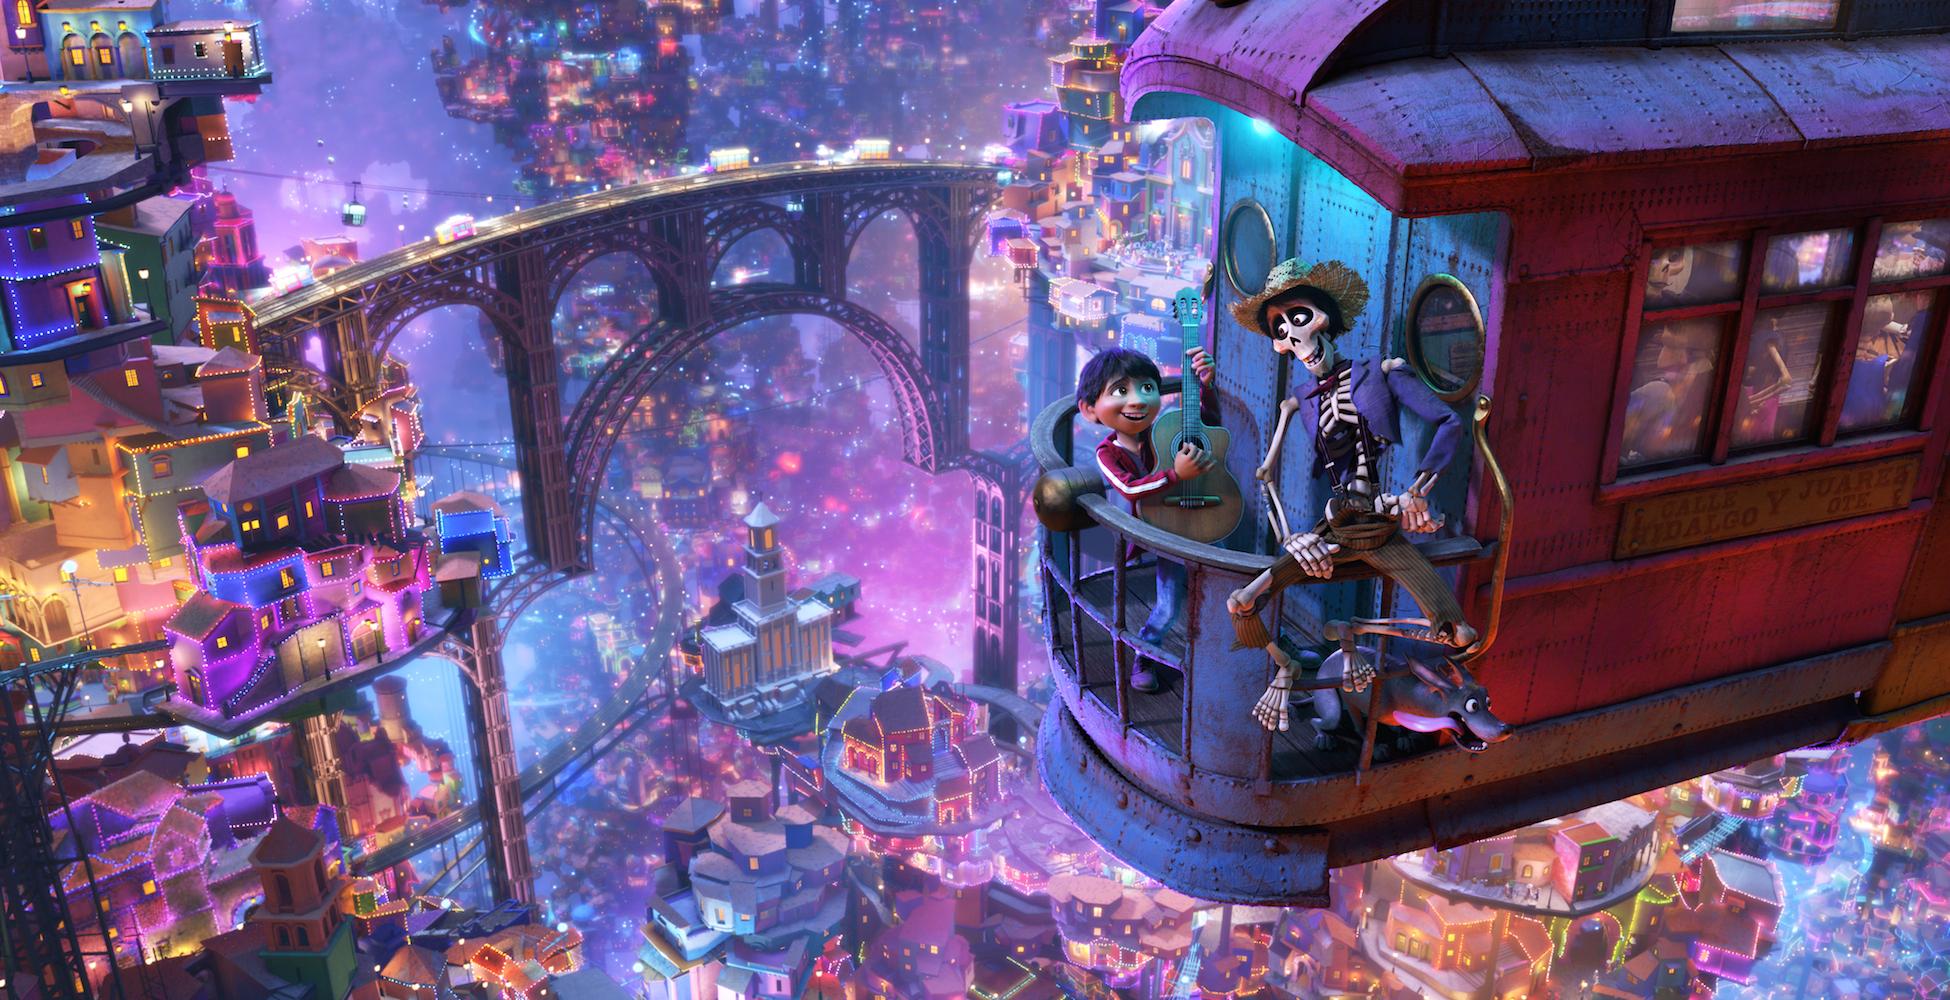 How Pixar's Animators Brought Gael Garcia Bernal's Skeleton Character to Life in 'Coco'